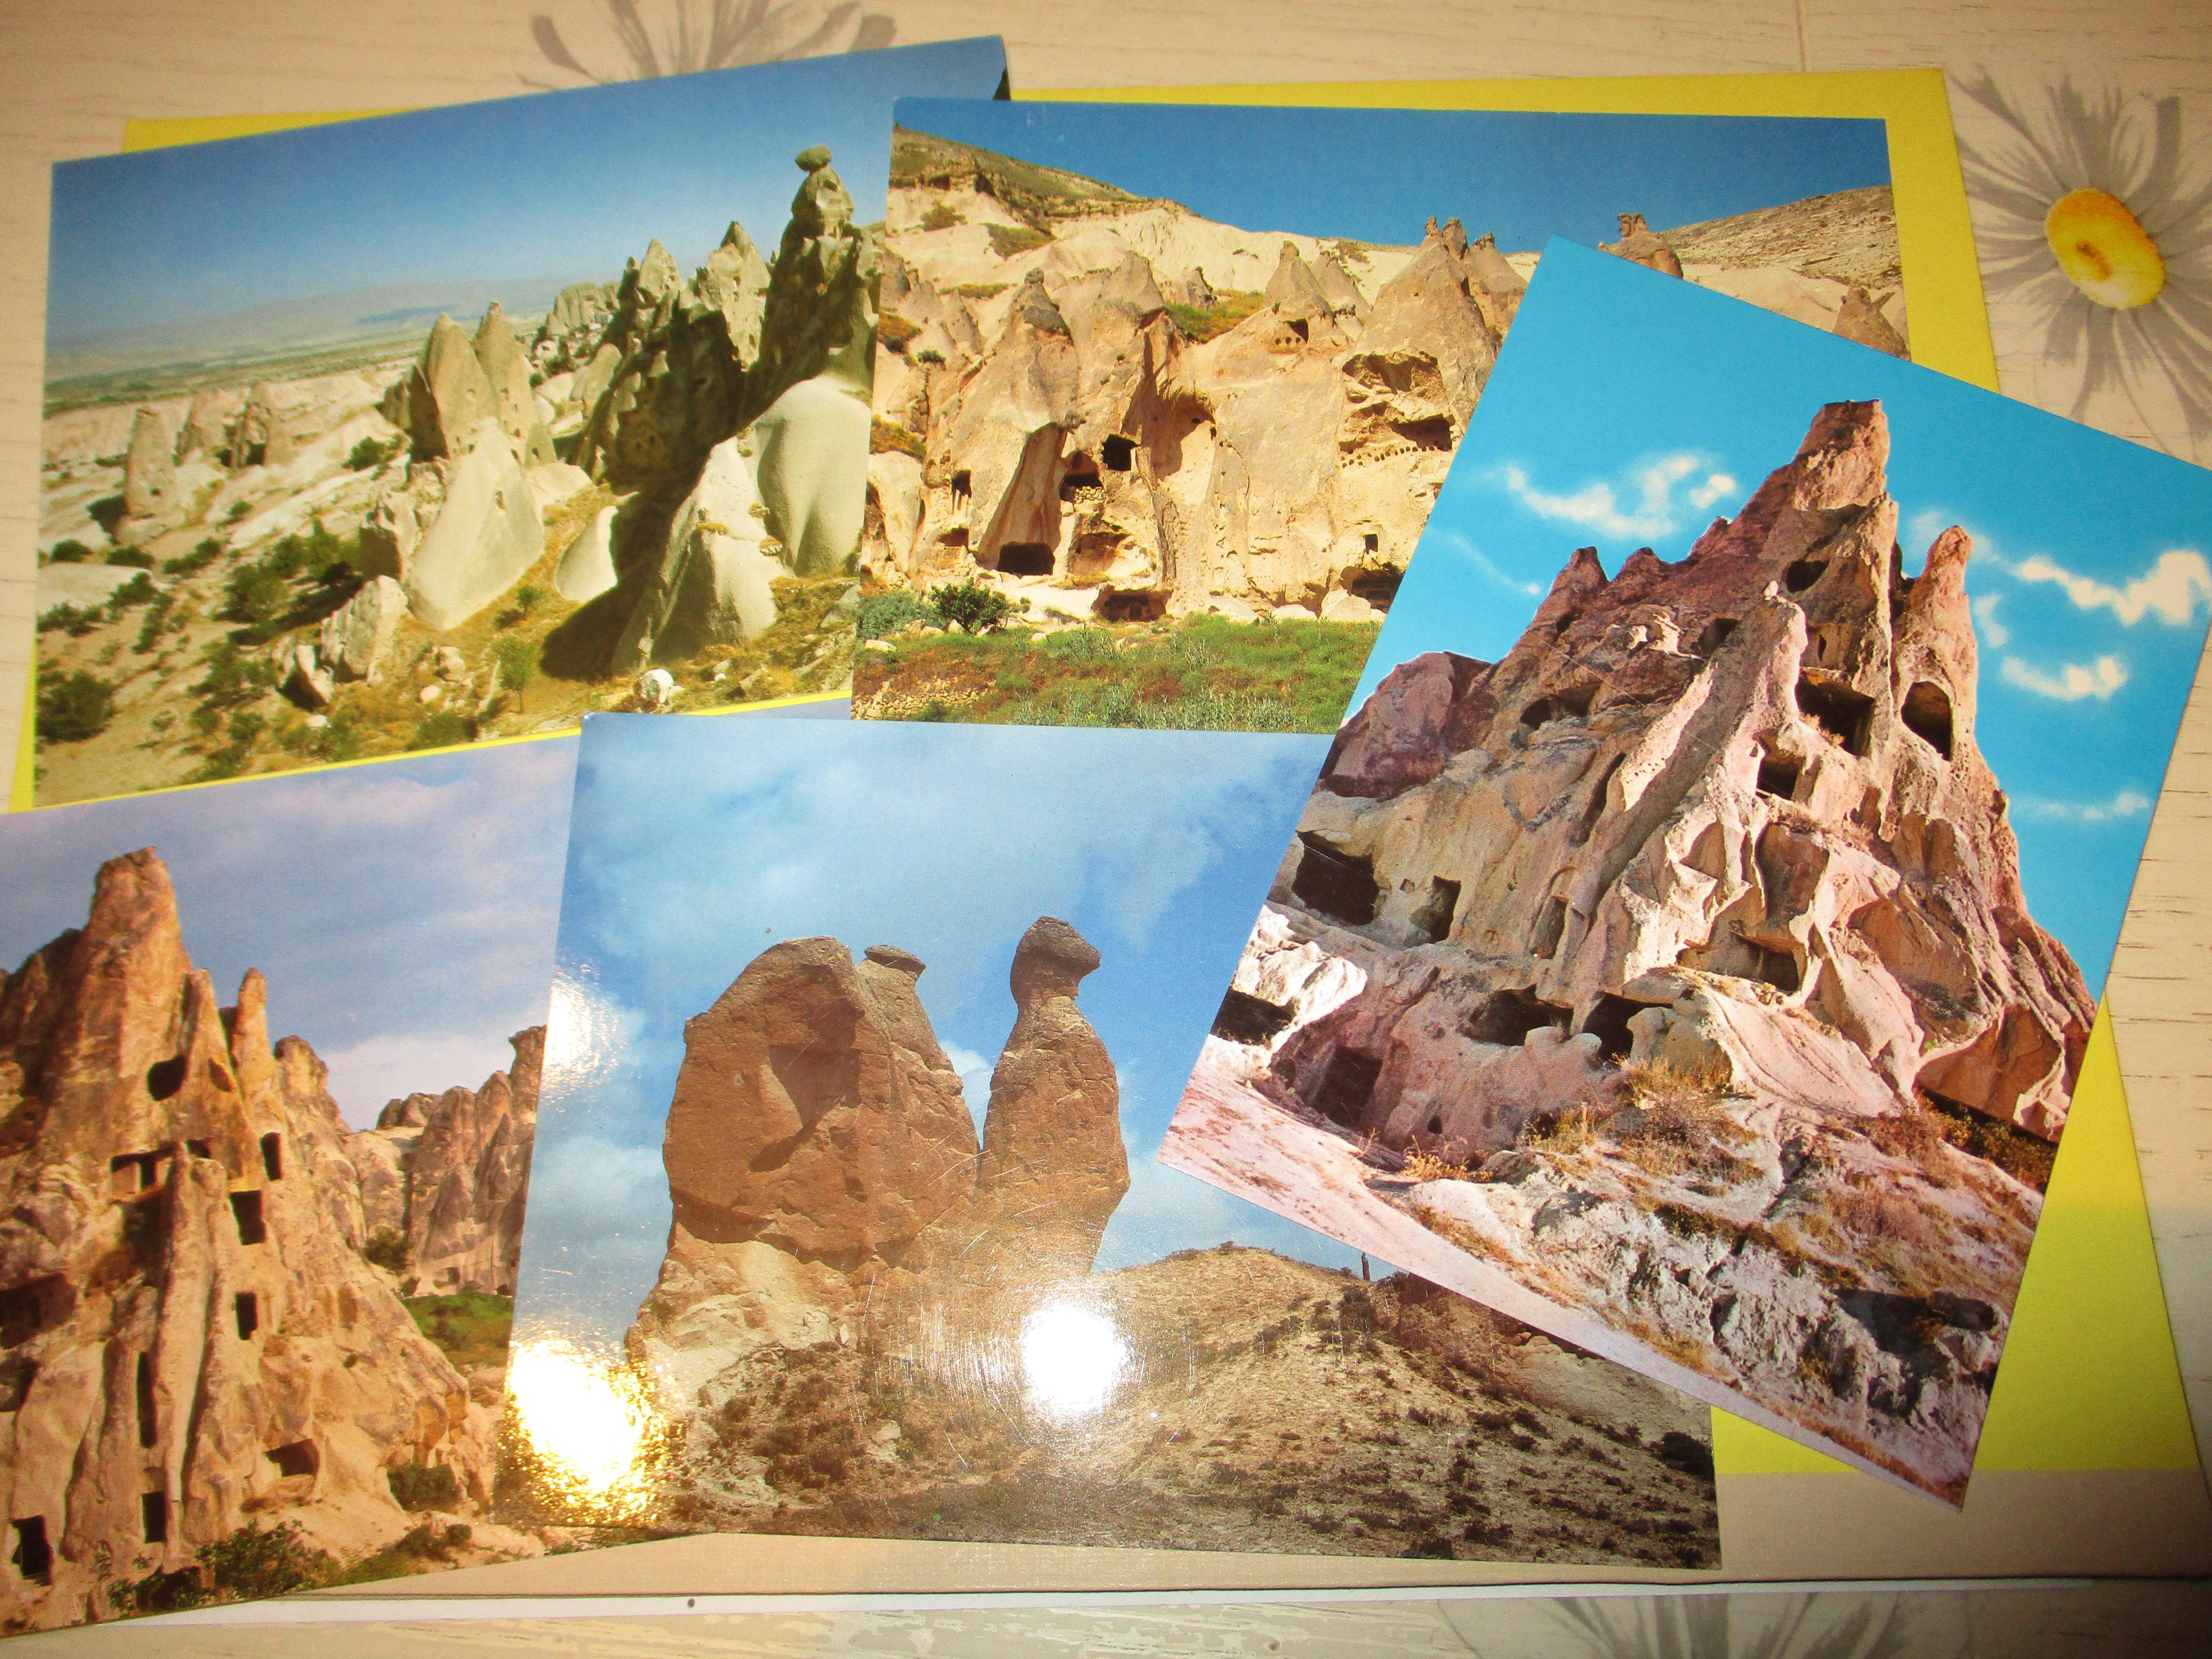 troc de troc 5 cartes postales neuves cappadocce turquie image 0